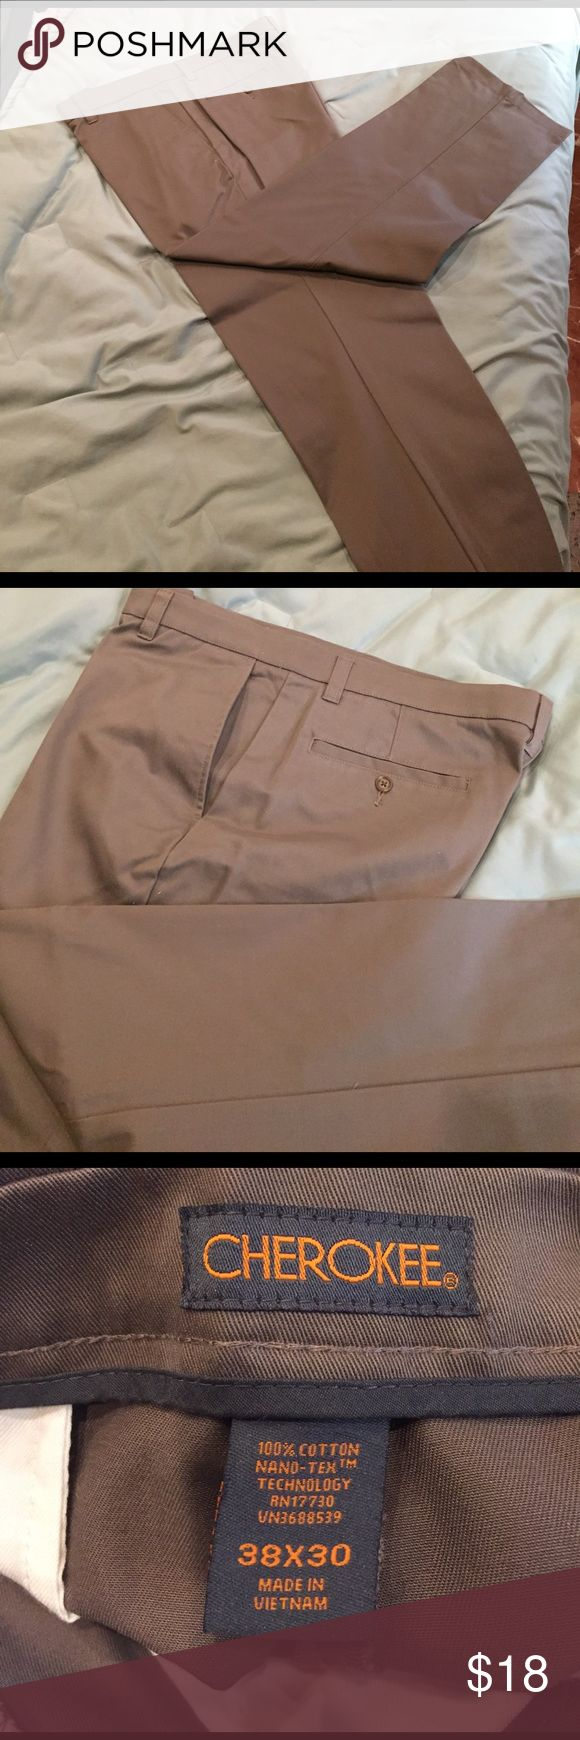 Casual men pants Wonderful men's casual pants beautiful condition taupe(lt brown) color Cherokee Pants Chinos & Khakis